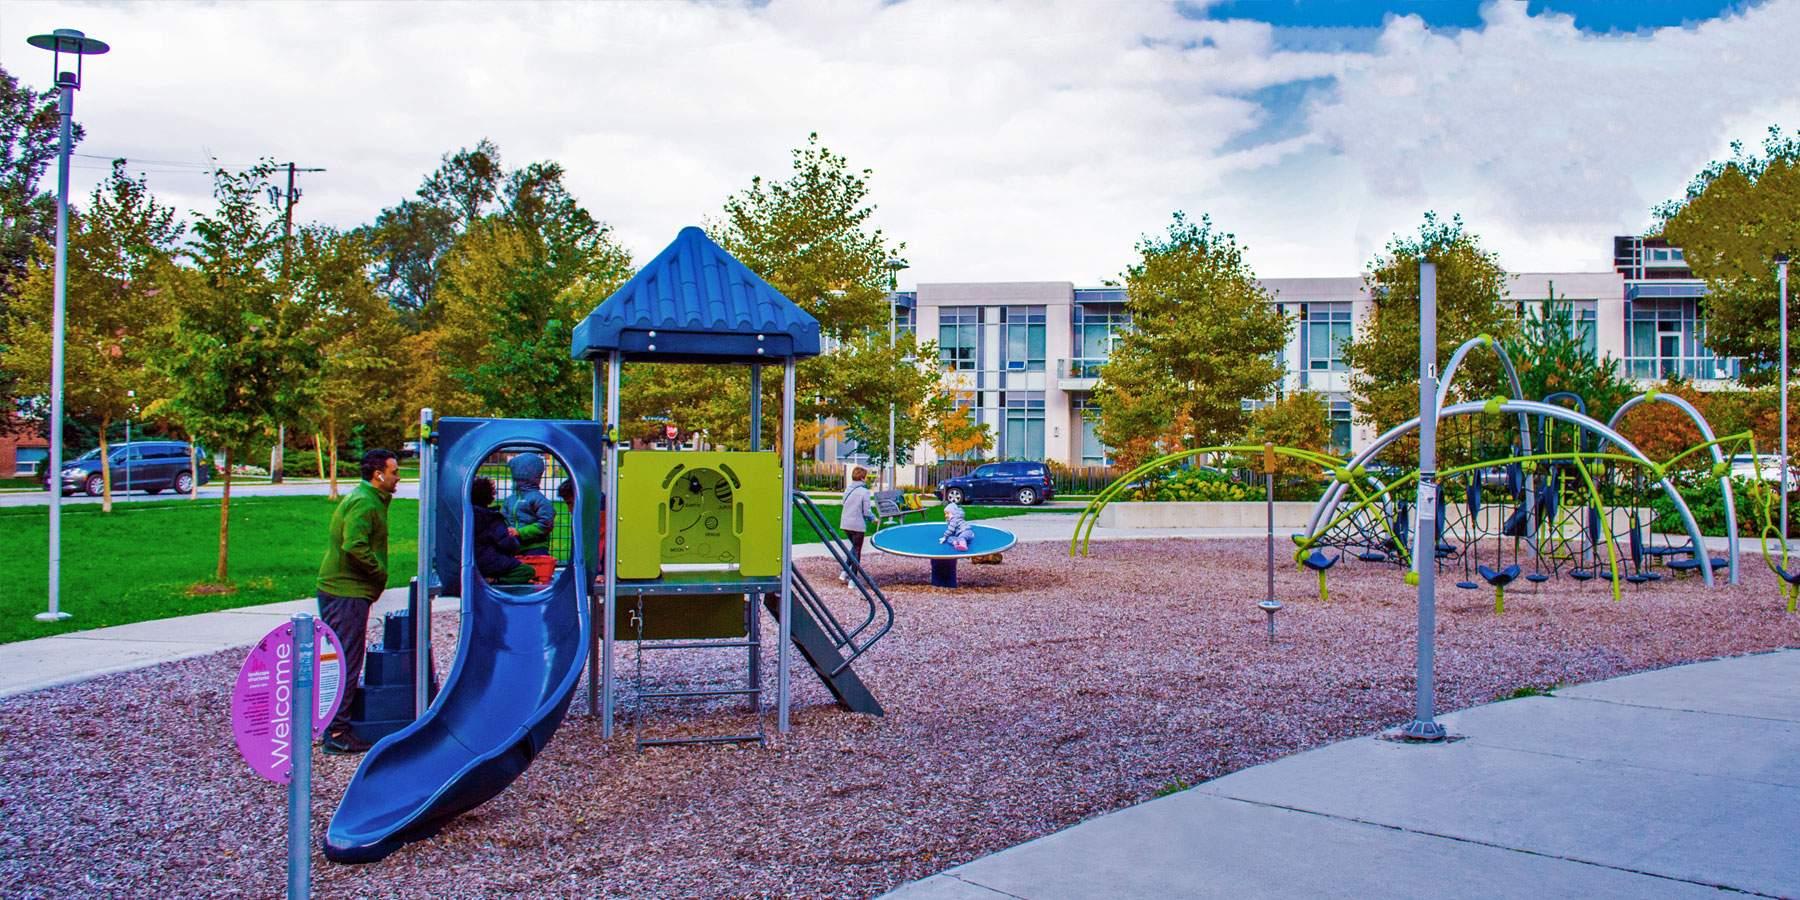 The Oaks Playground